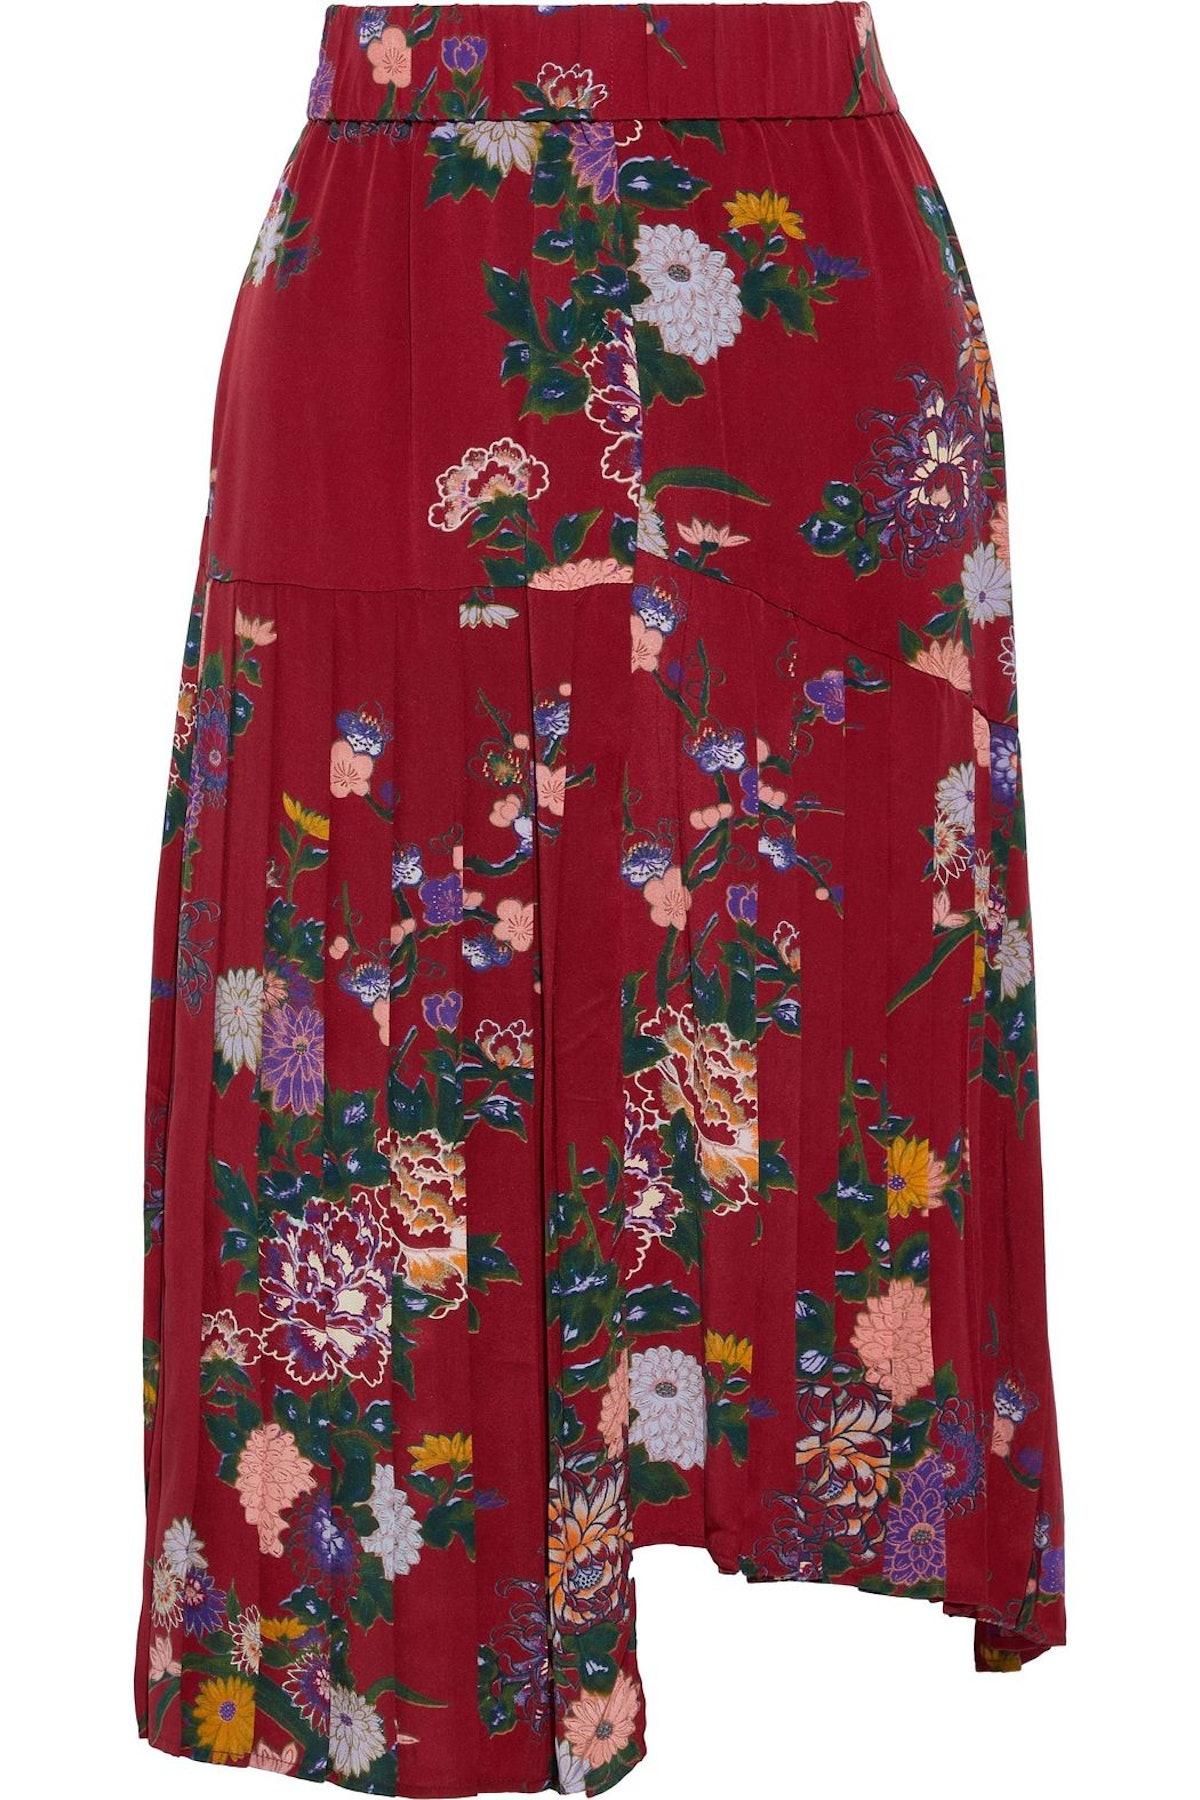 Isabel Marant Inaya Pleated Floral-Print Silk Skirt